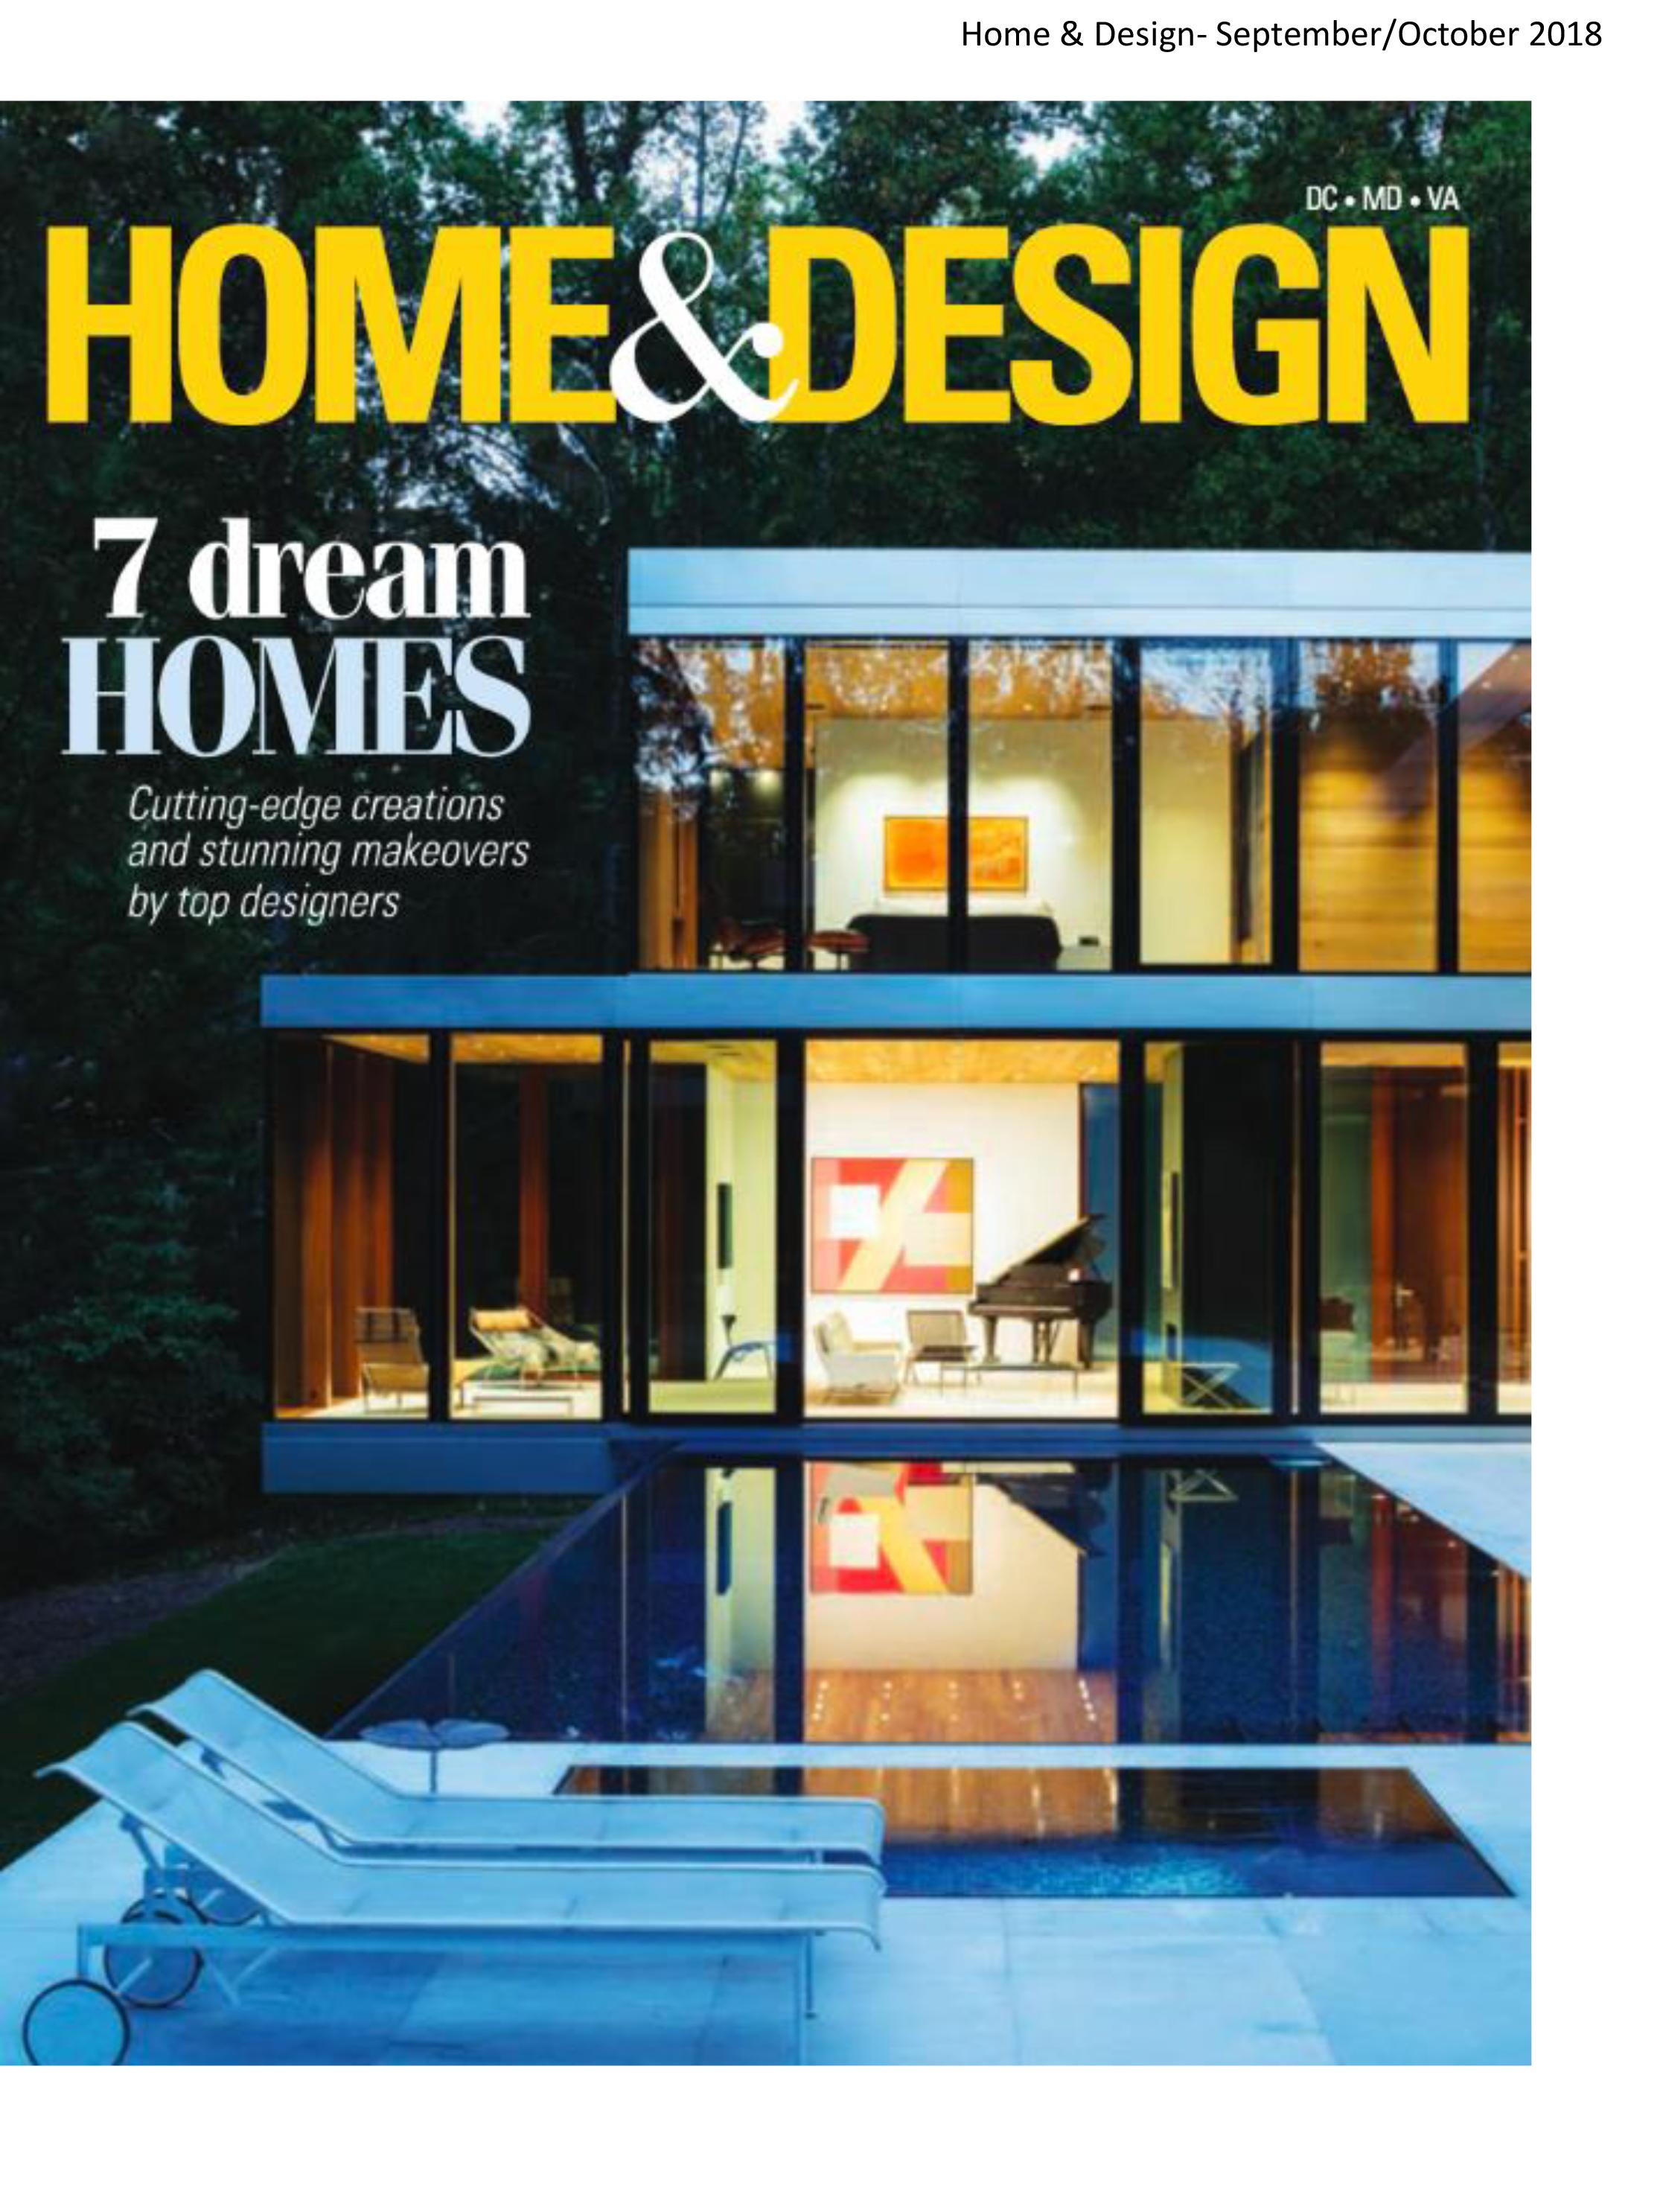 Home and Design- September.October 2018-1.jpg